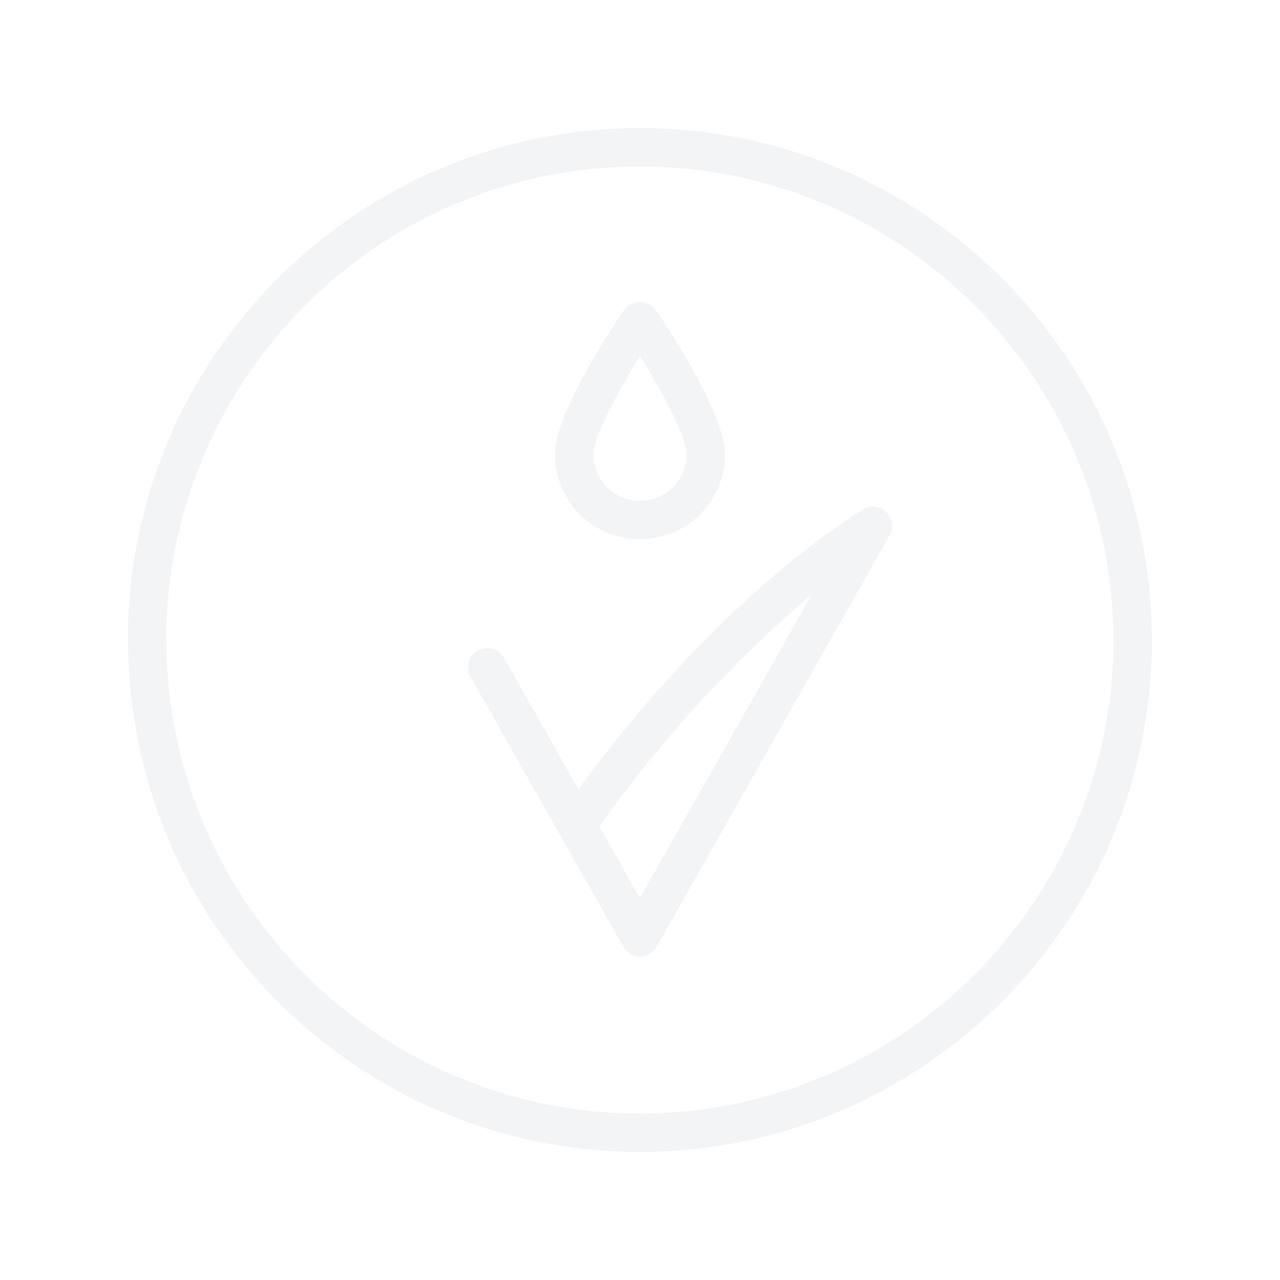 Gucci Bloom Nettare Di Fiori 100ml Eau De Parfum Gift Set Loverte